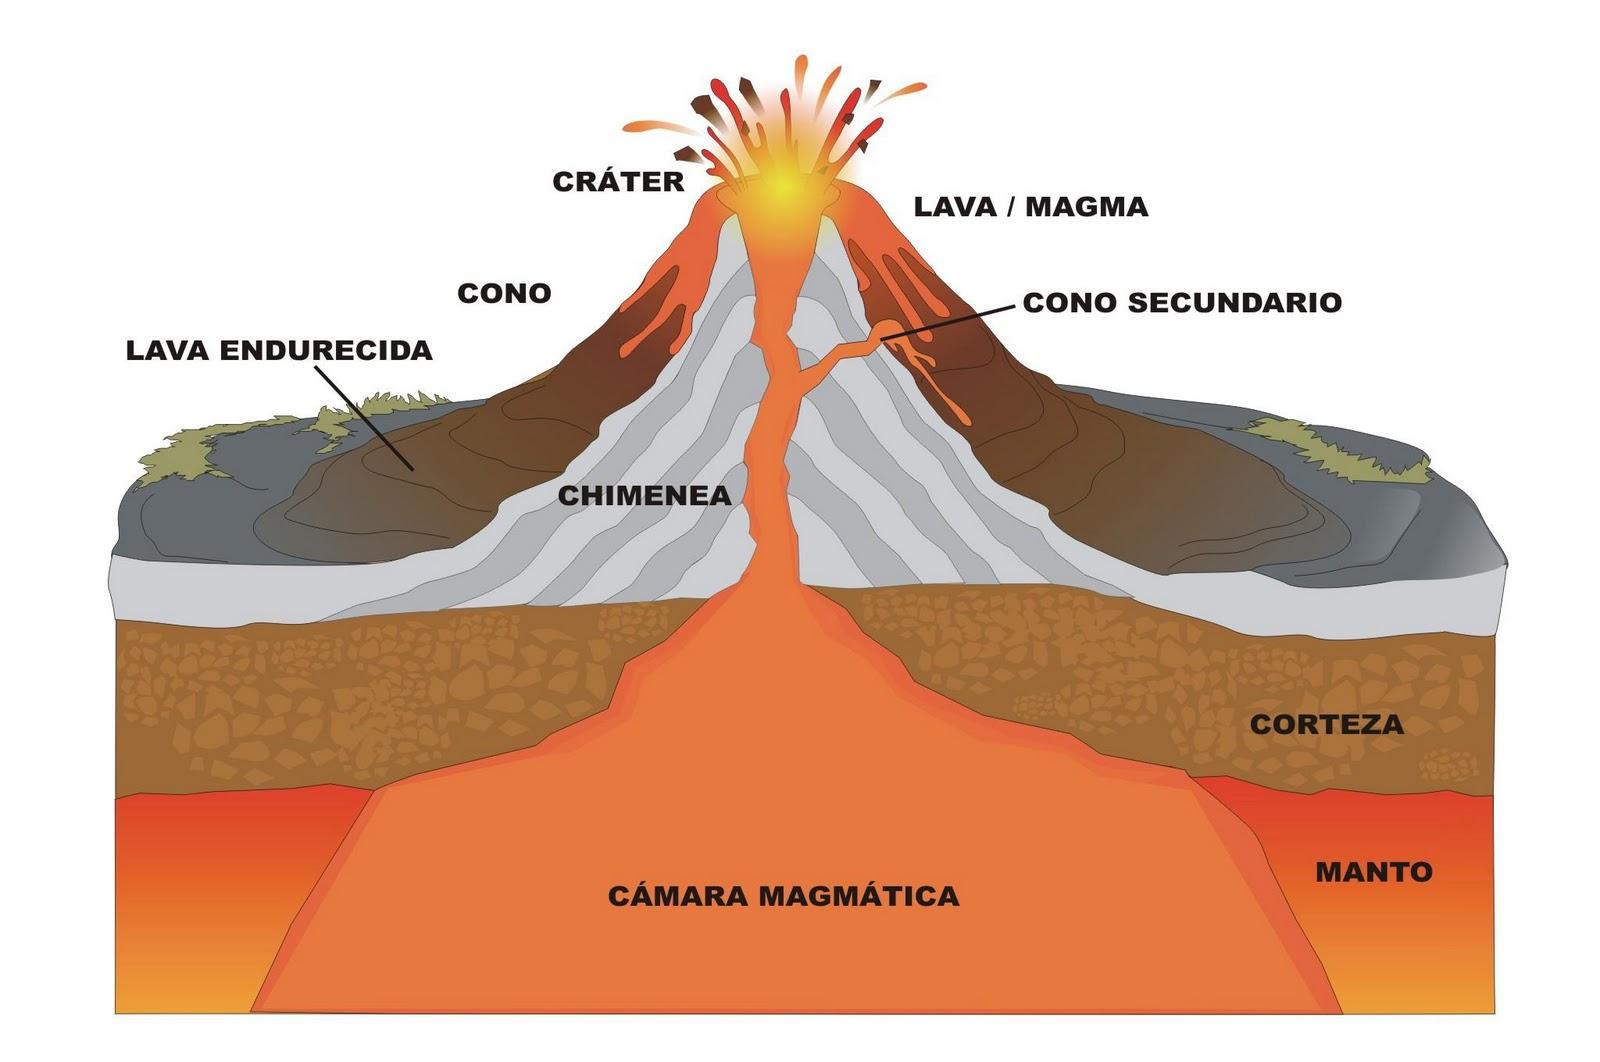 Stratovolcano Diagram With Labels Venn Formula For 2 Sets Proyecto Erupciones Volcánicas: Los Volcanes